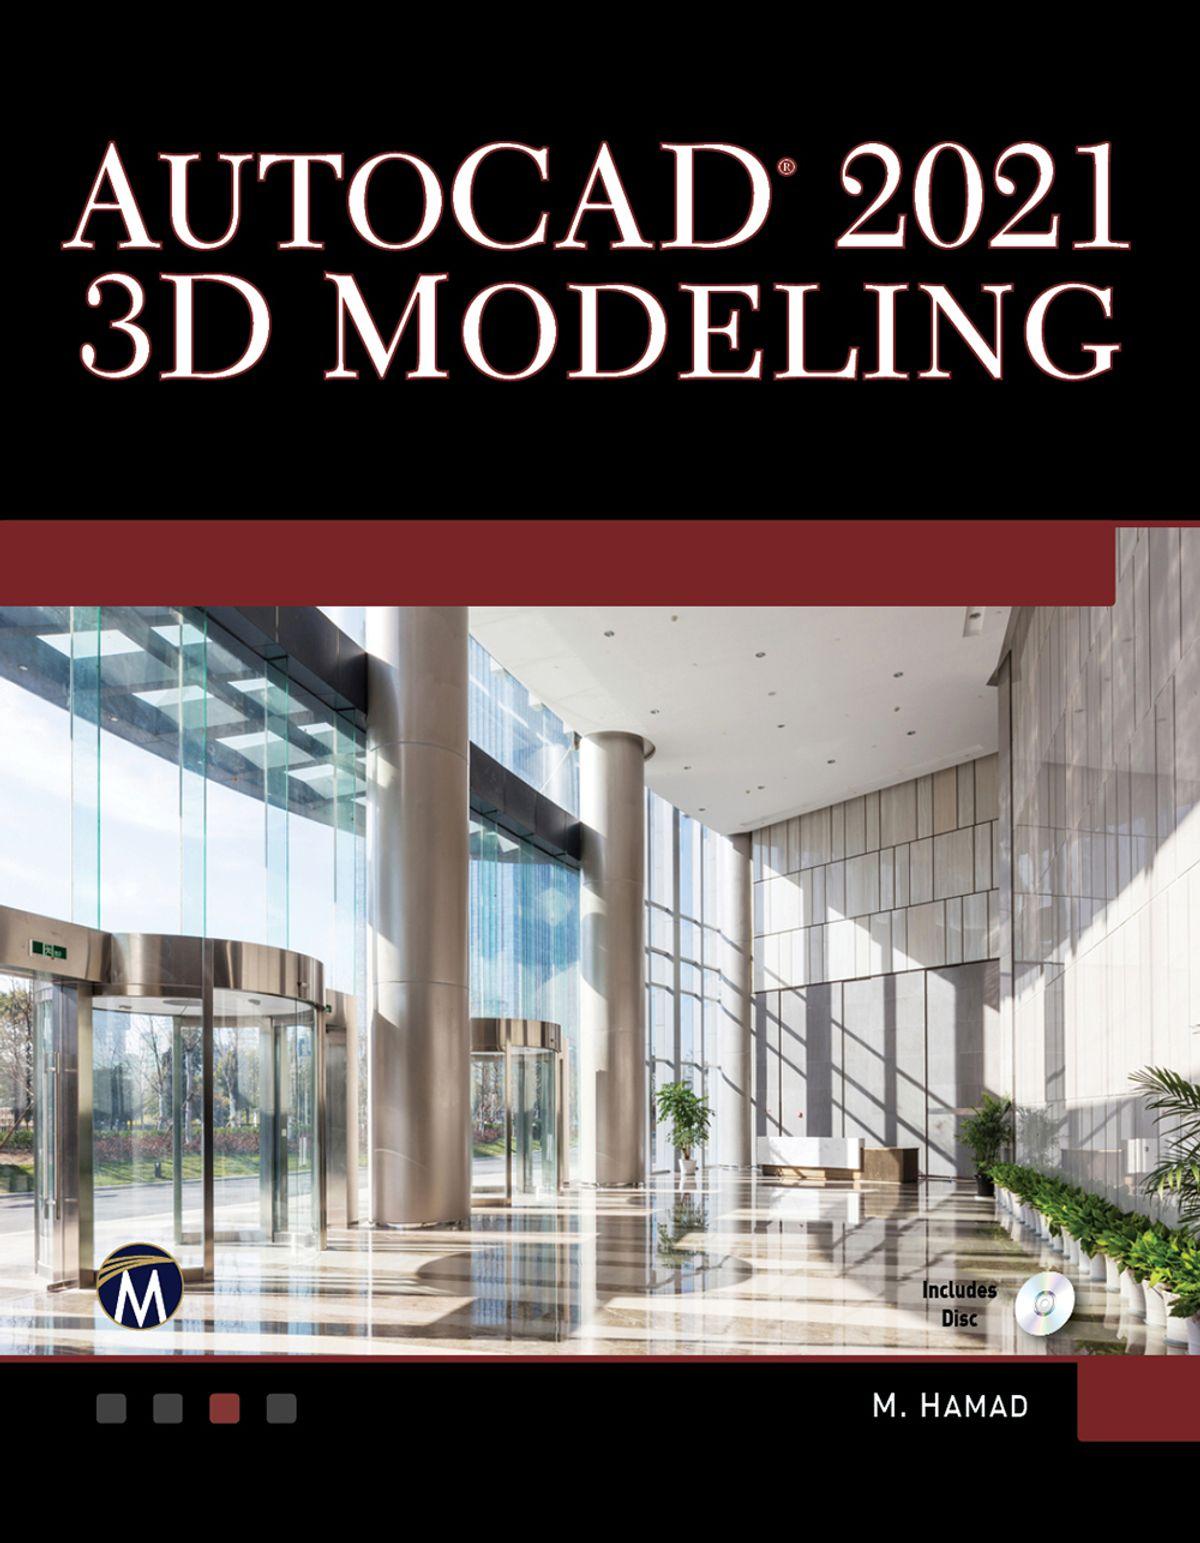 AutoCAD 2022 3D Modeling traing tutorials